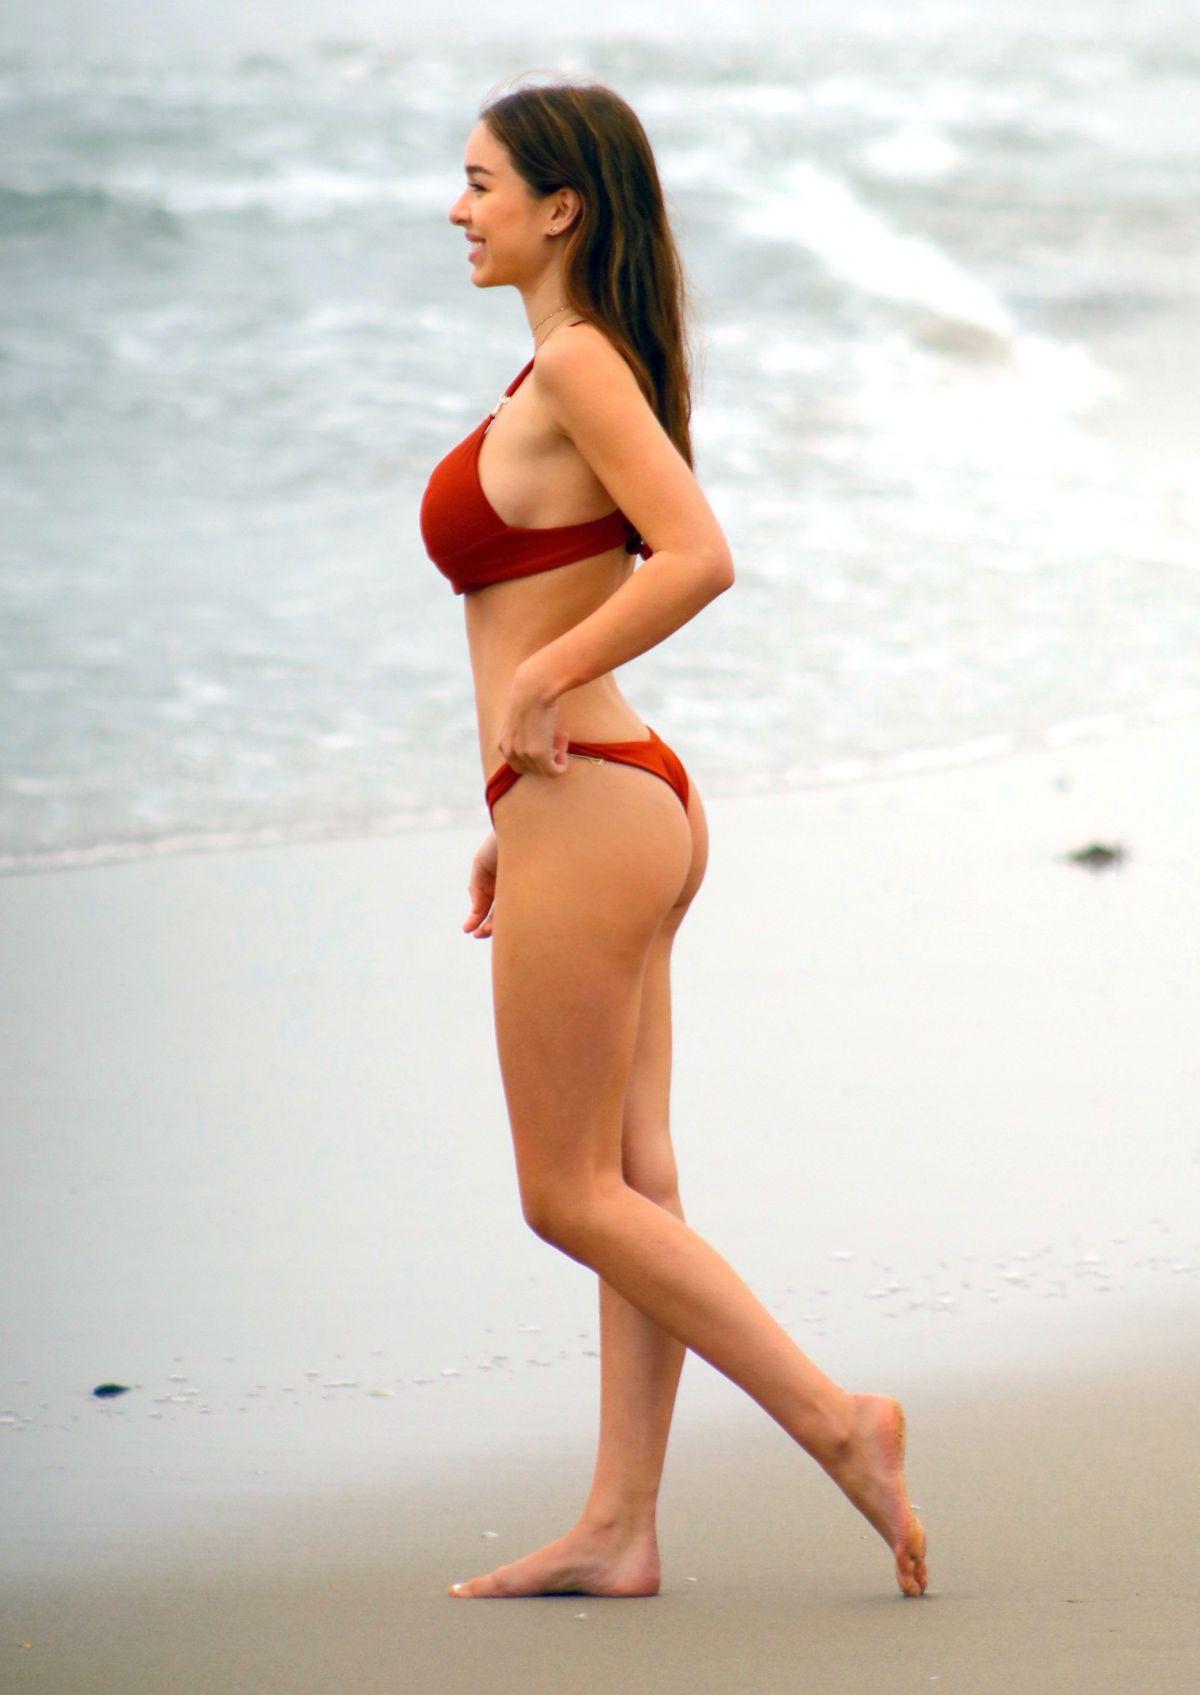 Sophie Mudd in Red Bikini on the beach in Malibu Pic 10 of 35